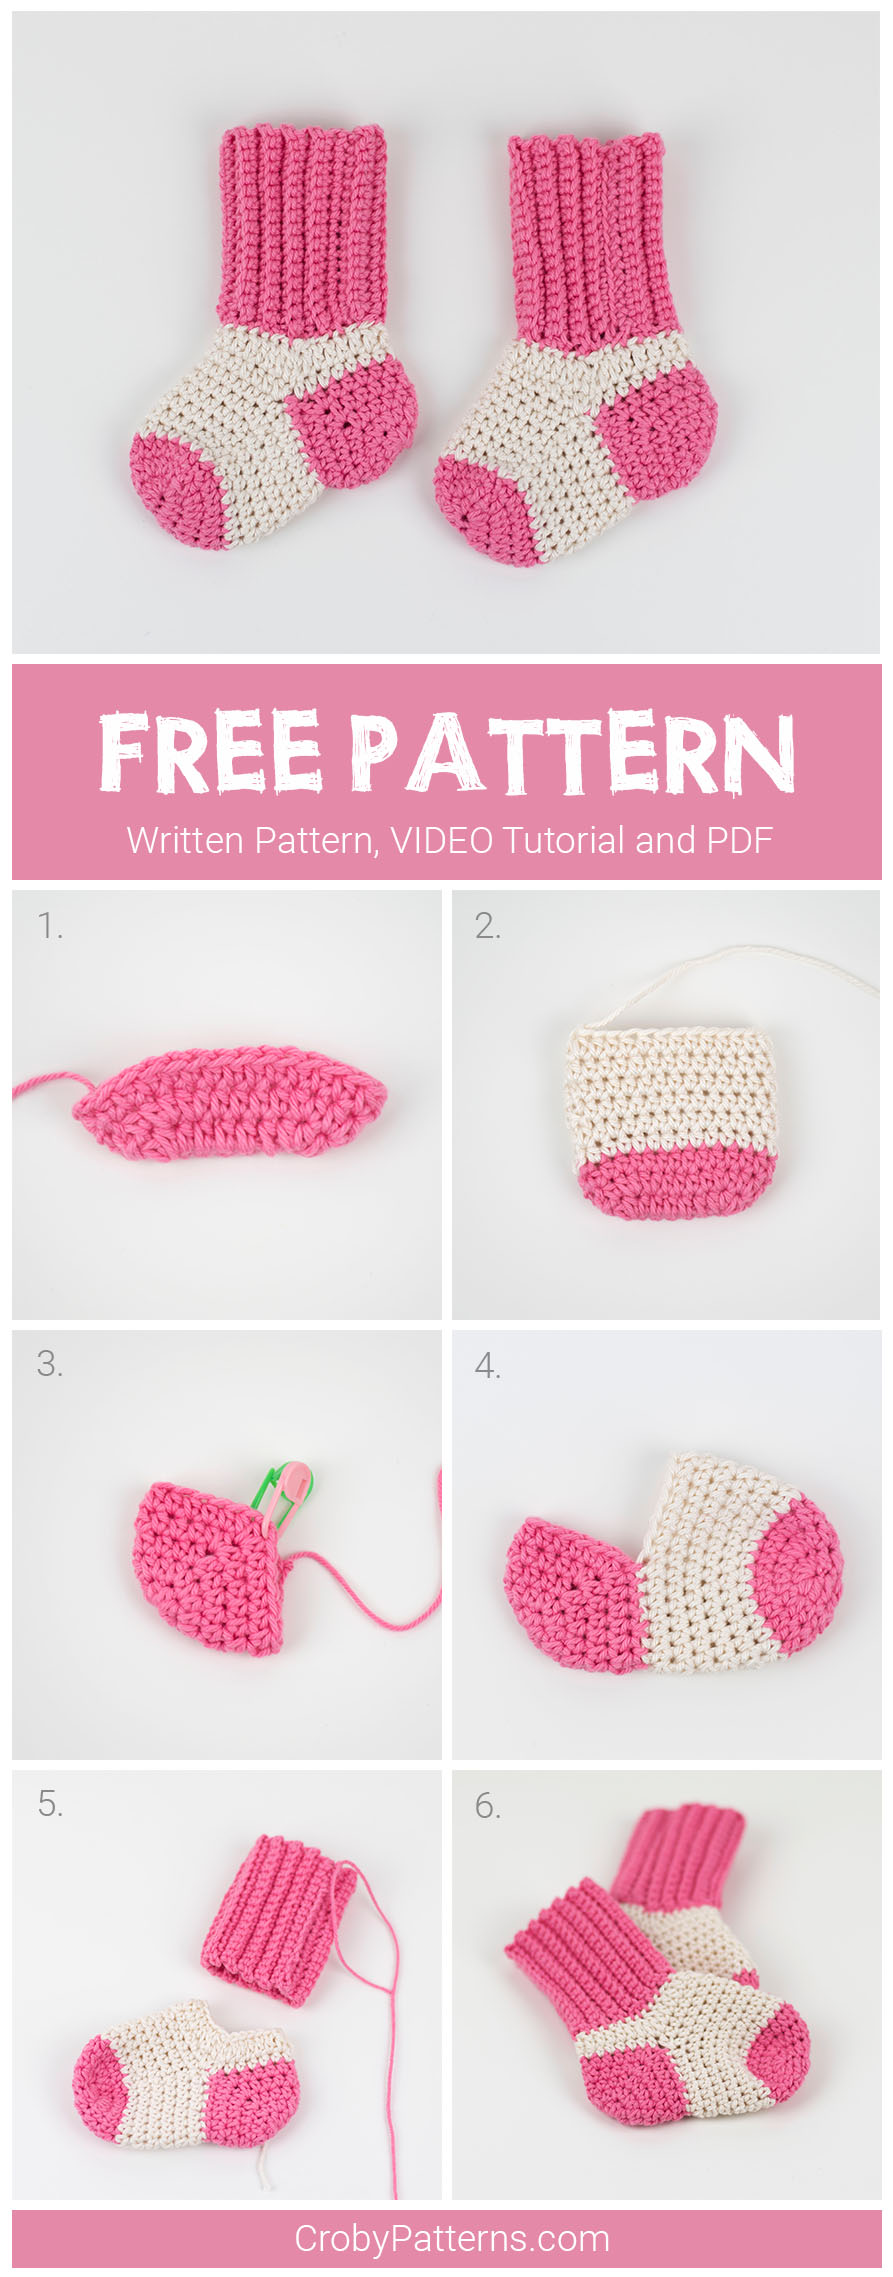 Free Pattern Tiny Socks For Tiny Feet Croby Patterns